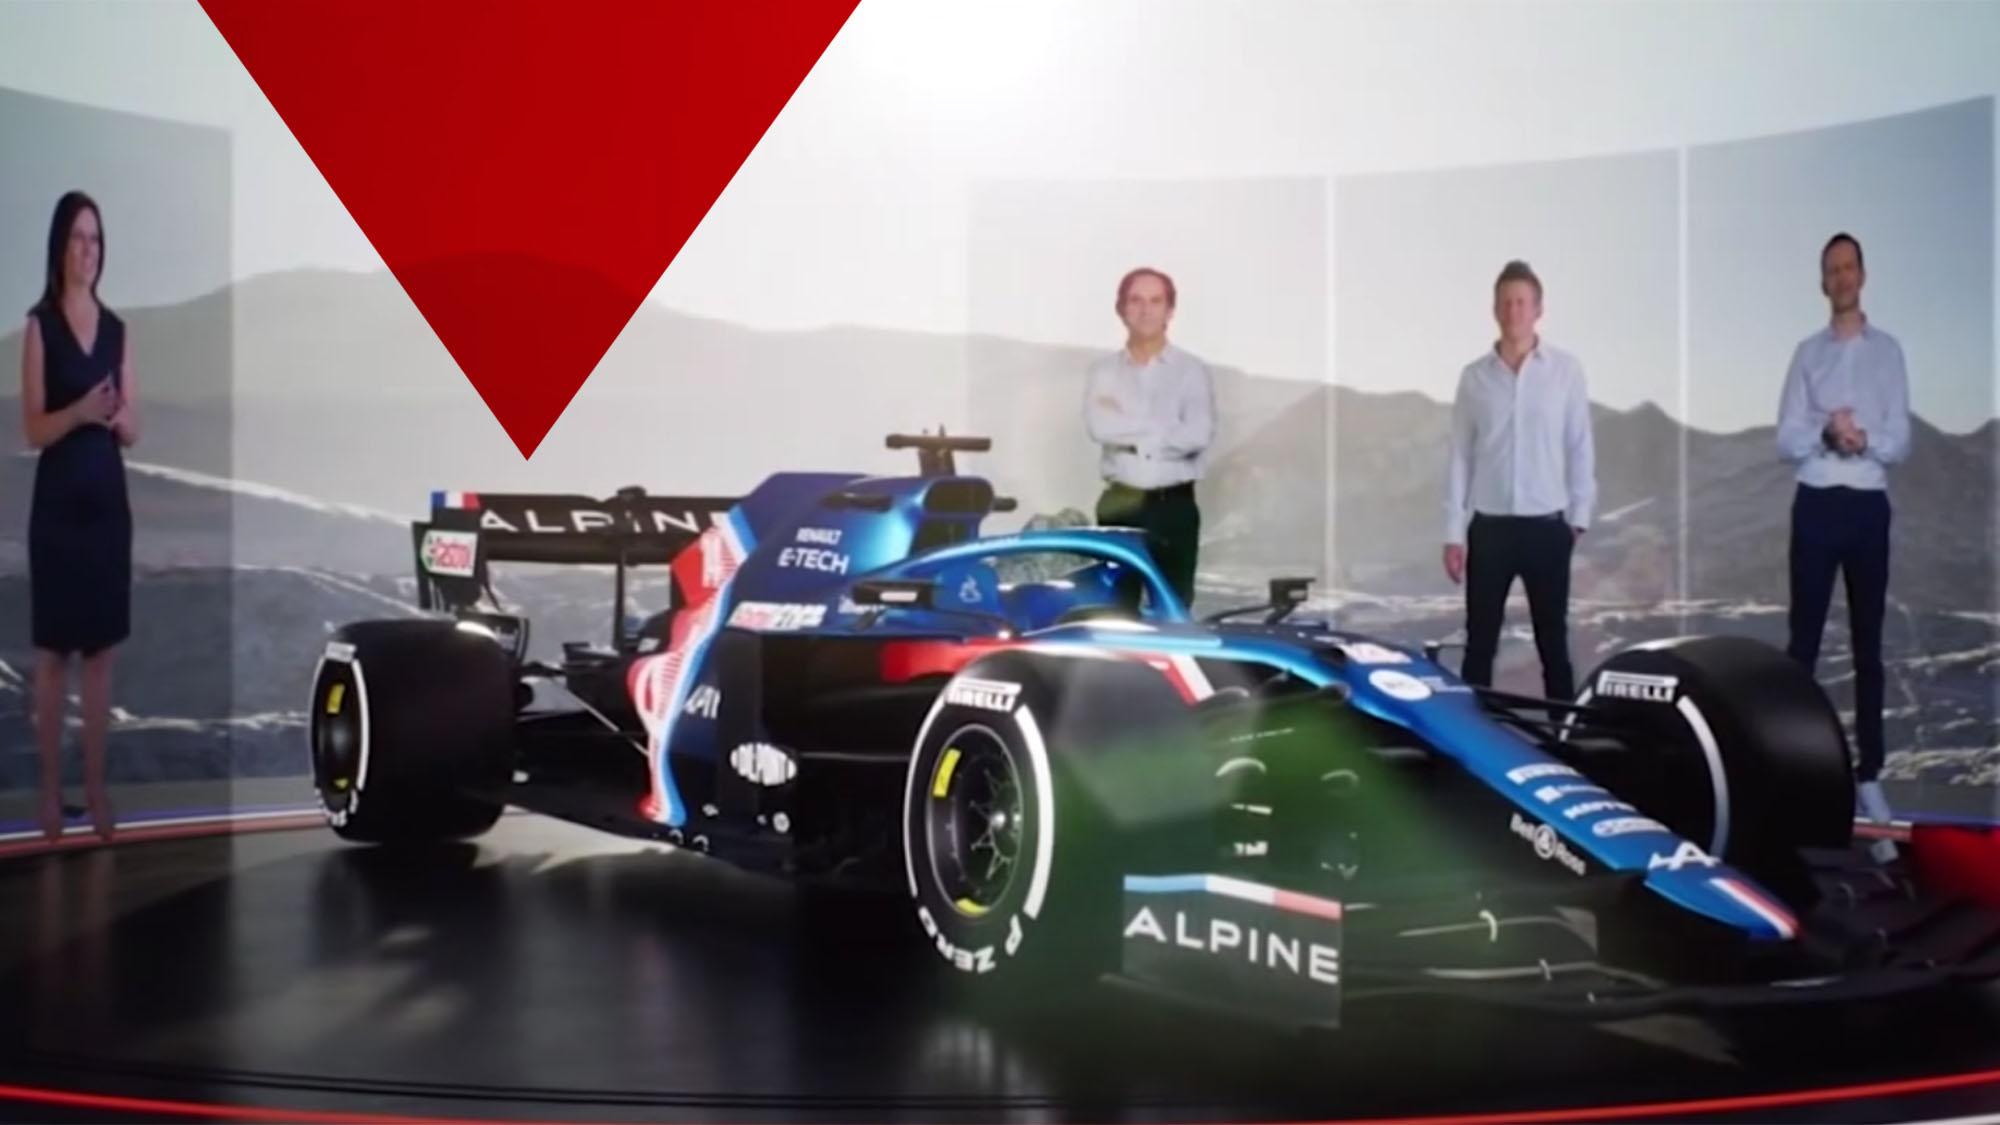 Alpine presentation